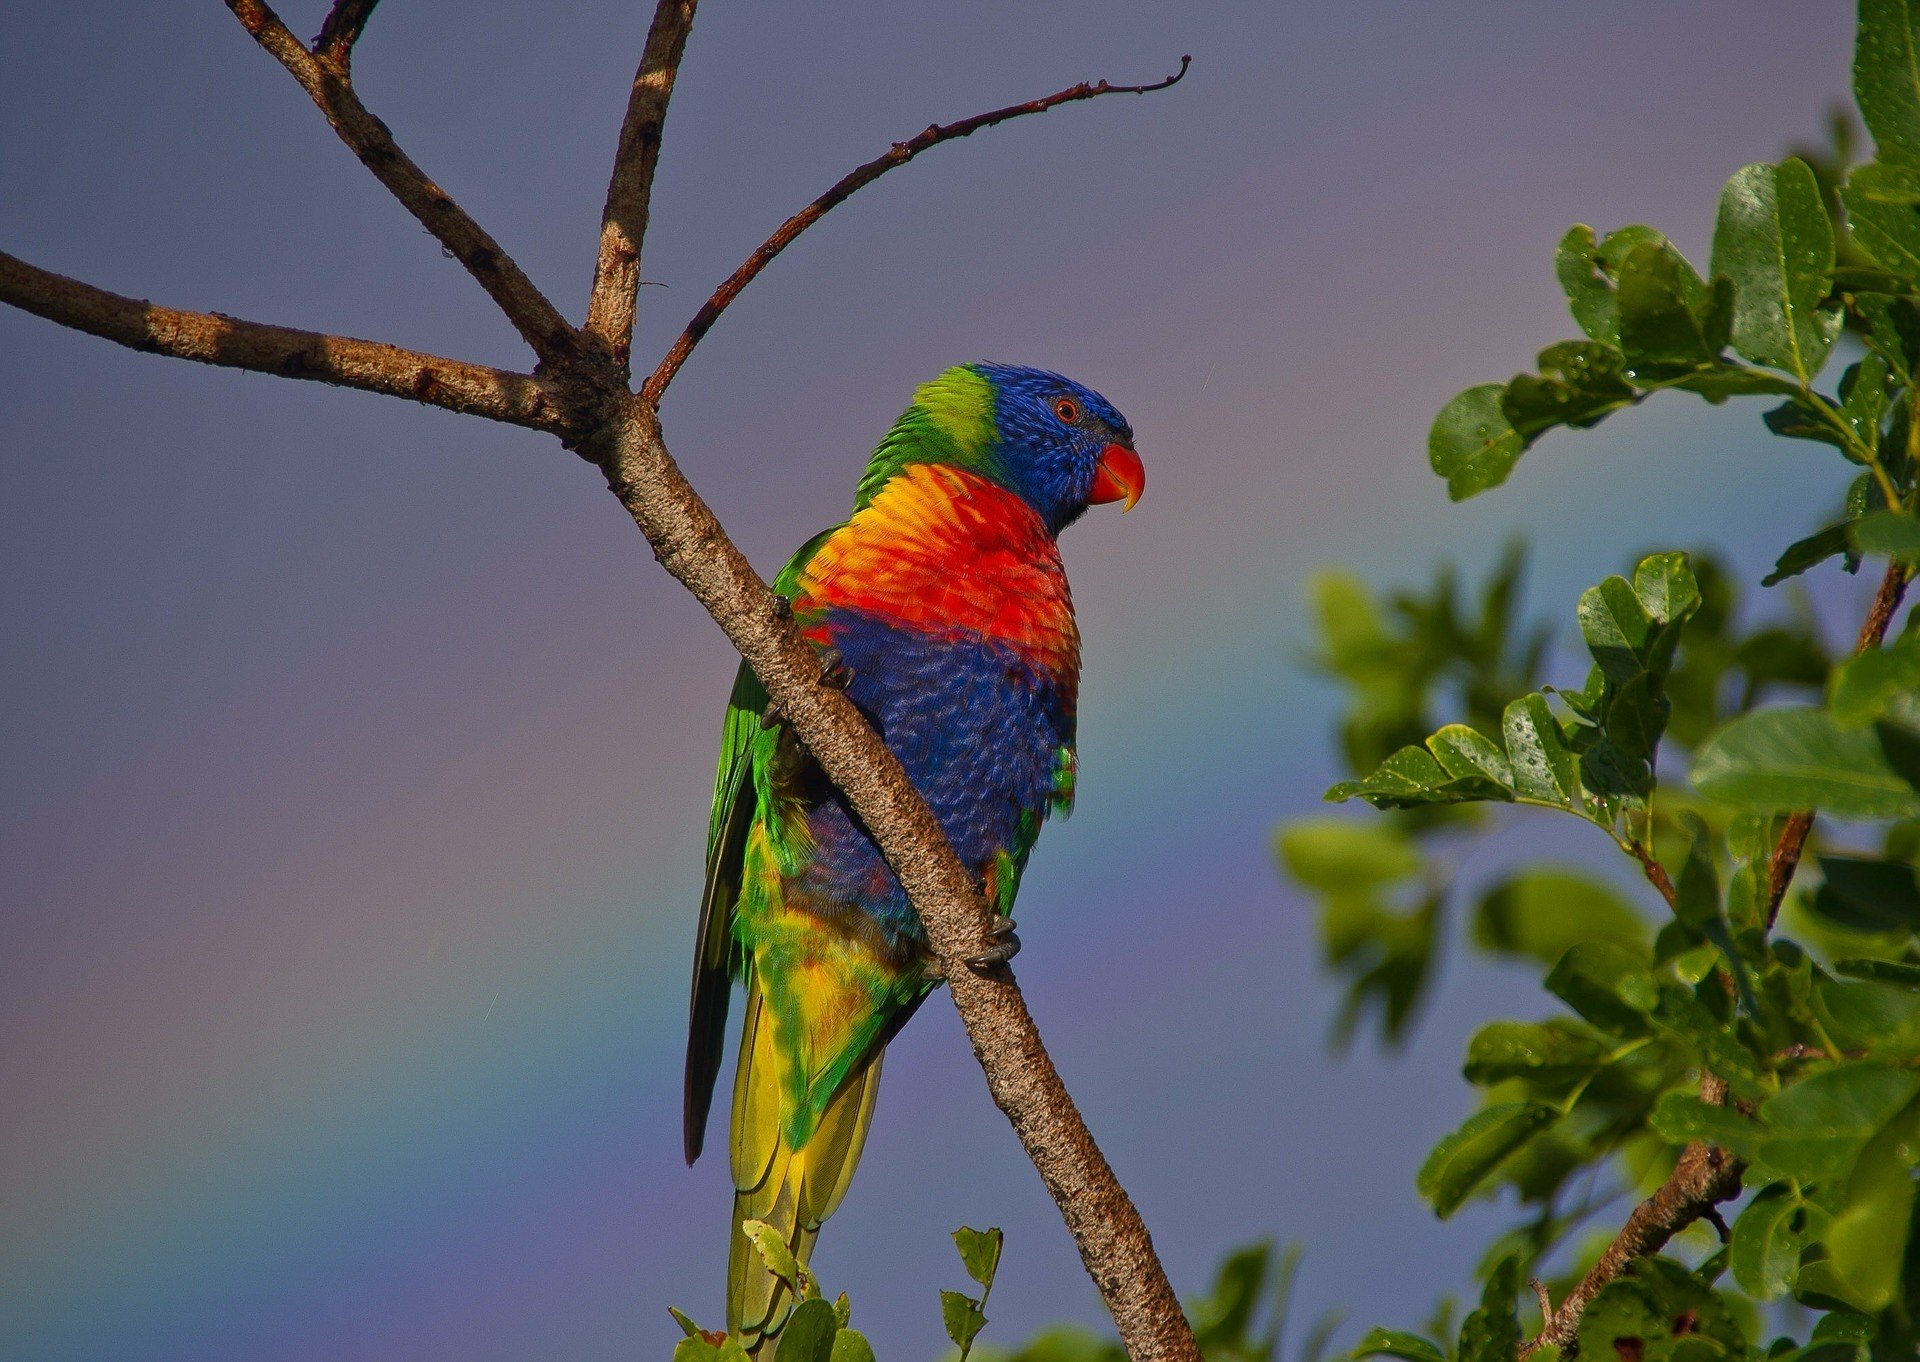 Currumbin Wildlife Sanctuary, Gold Coast